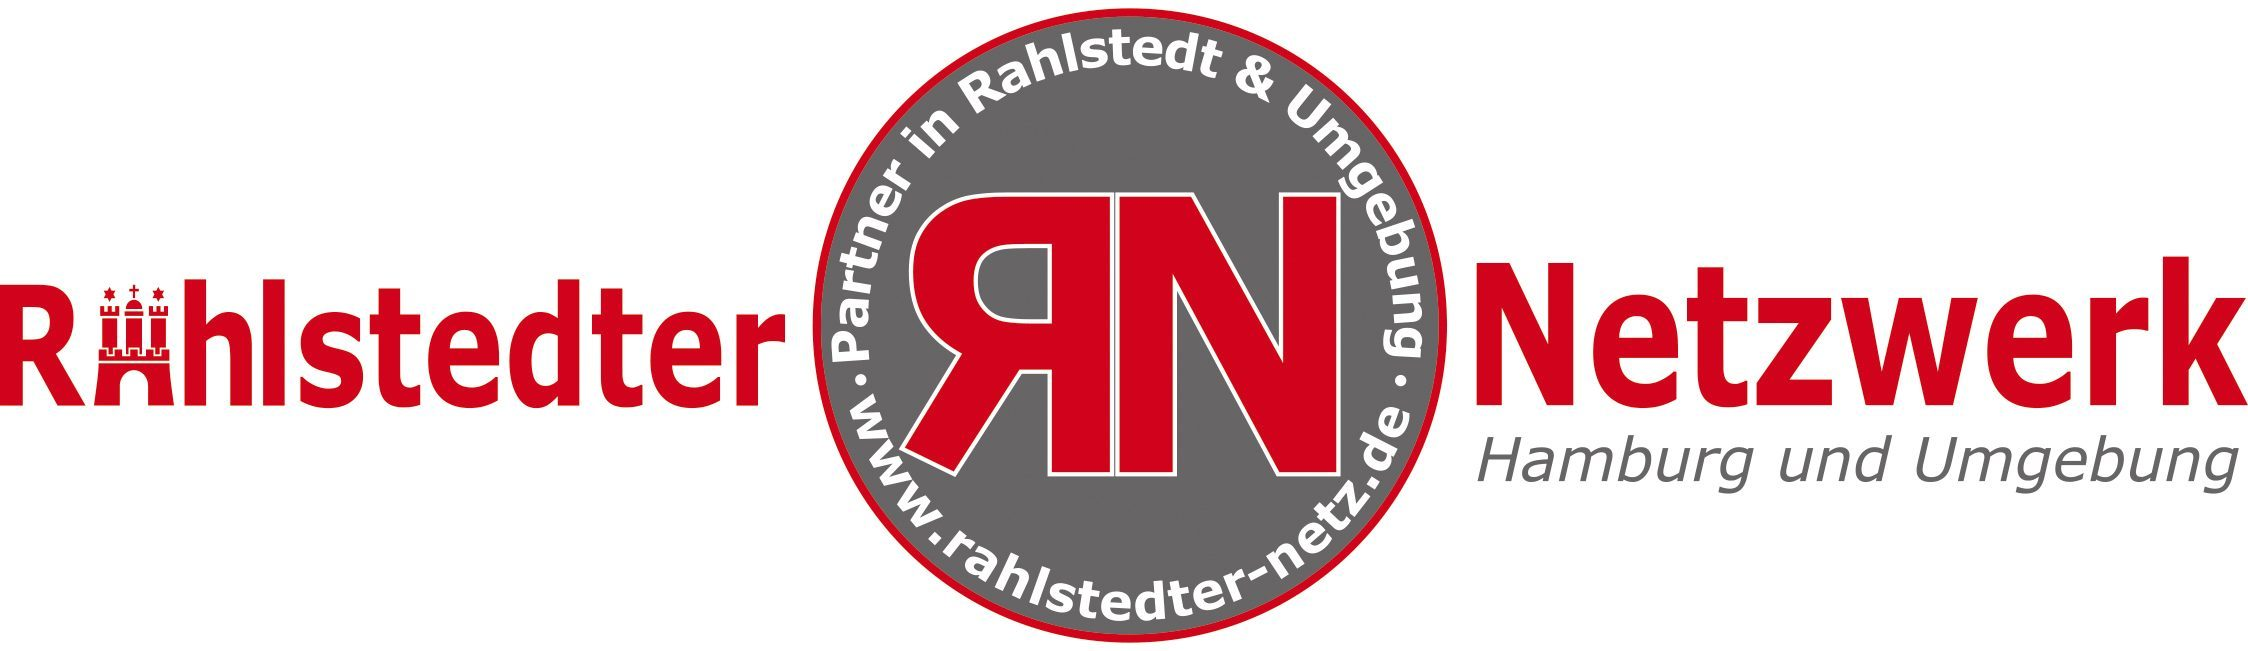 Rahlstedter Netz